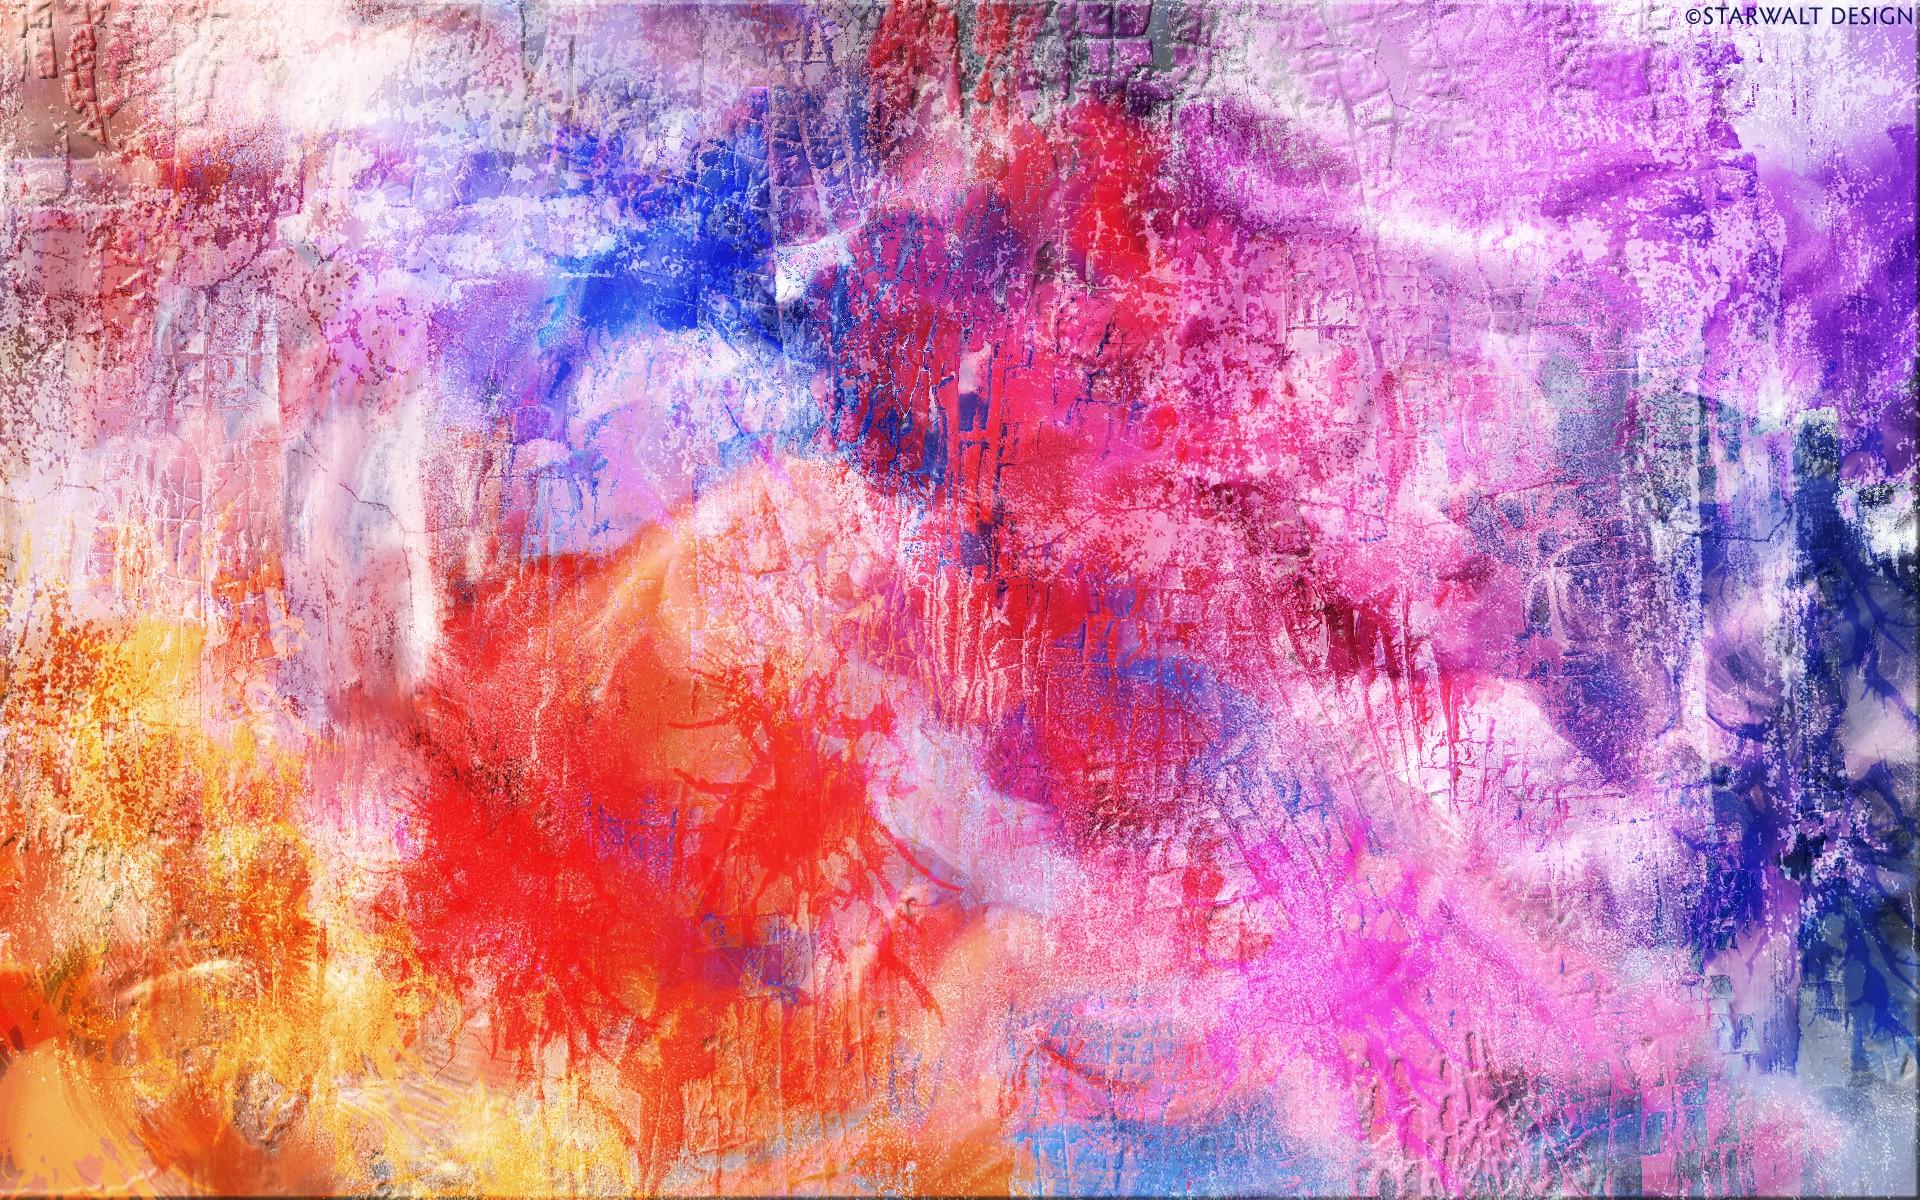 abstract digital art wallpapers hd free 562445